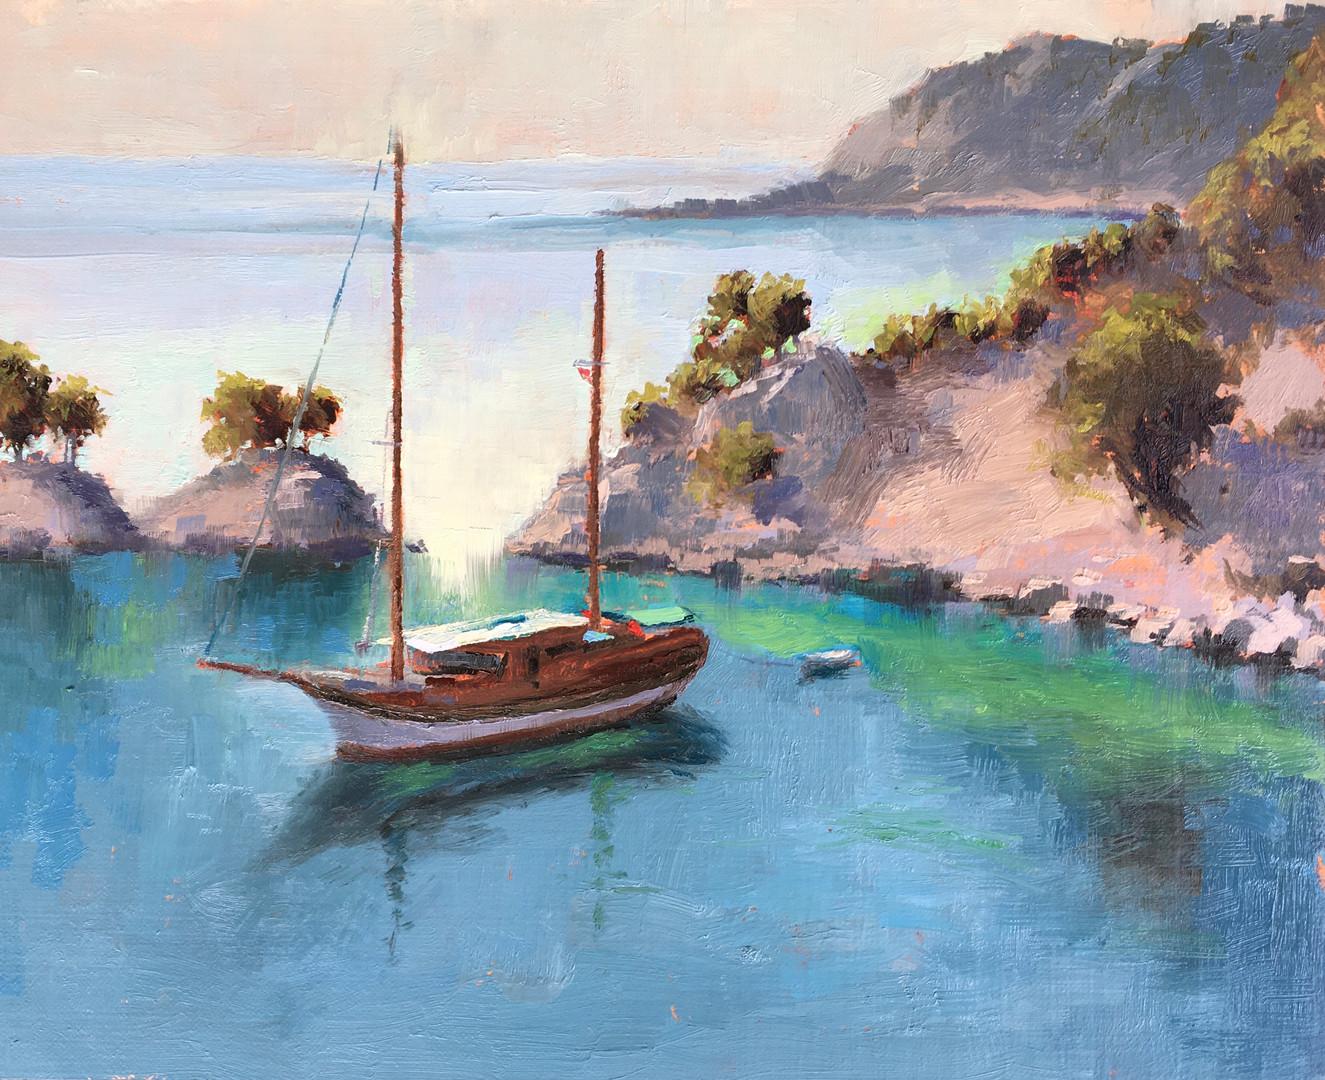 Gulet in the Aegean Sea